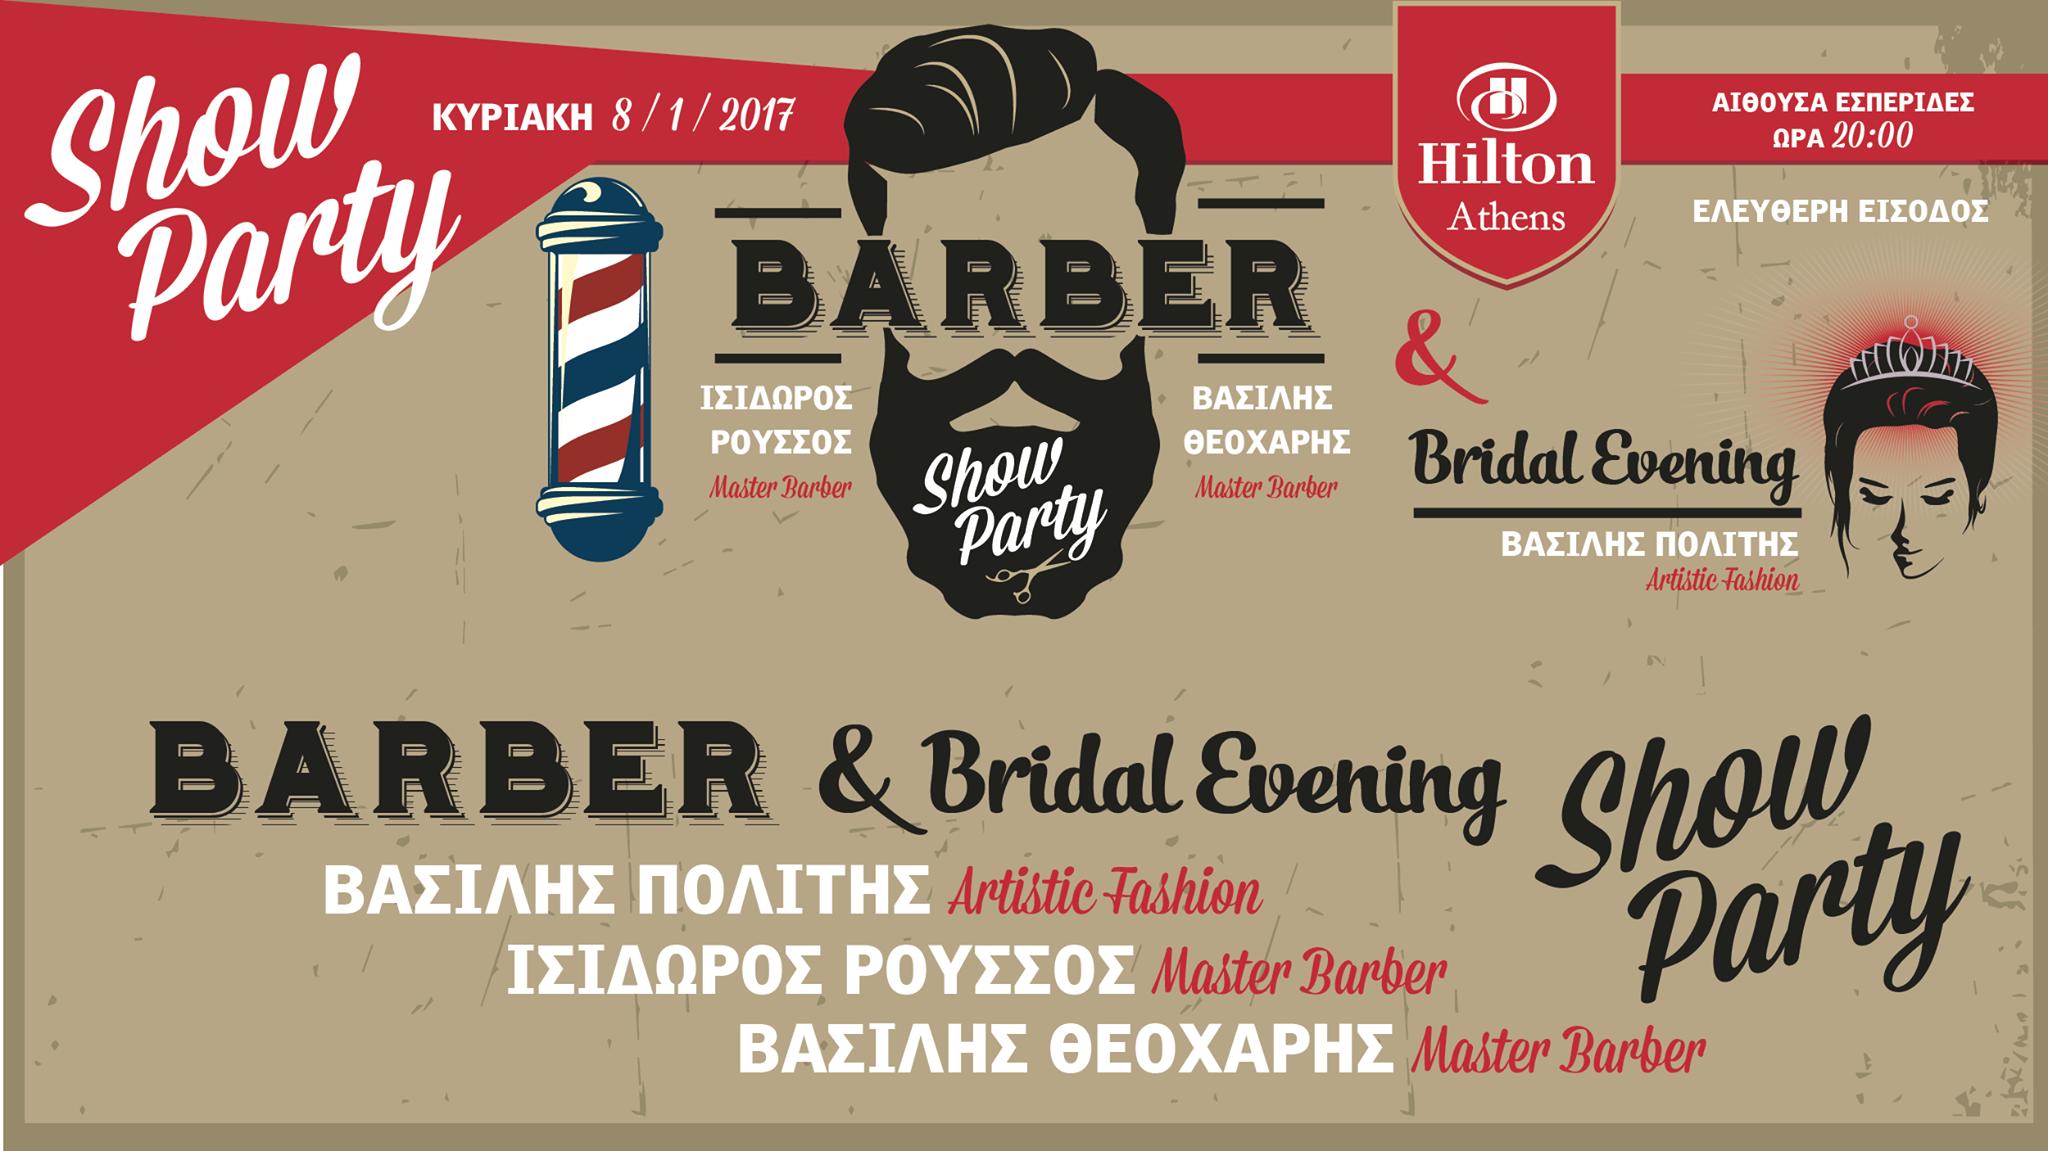 Barber & Bridal Evening Show Party | aria PR